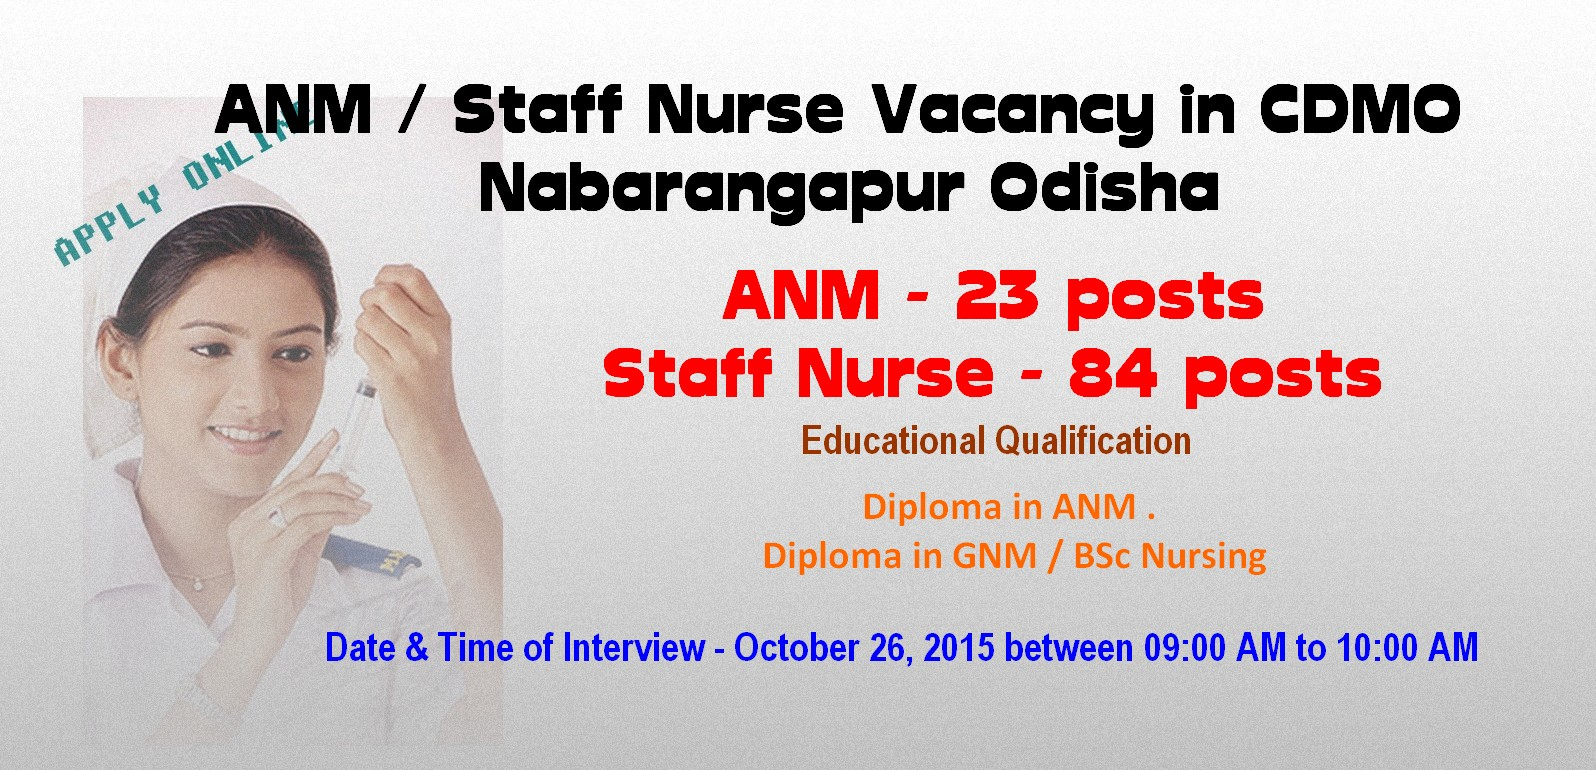 nurses job vacancy anm staff nurse vacancy in cdmo nabarangapur anm staff nurse vacancy in cdmo nabarangapur odisha 2015